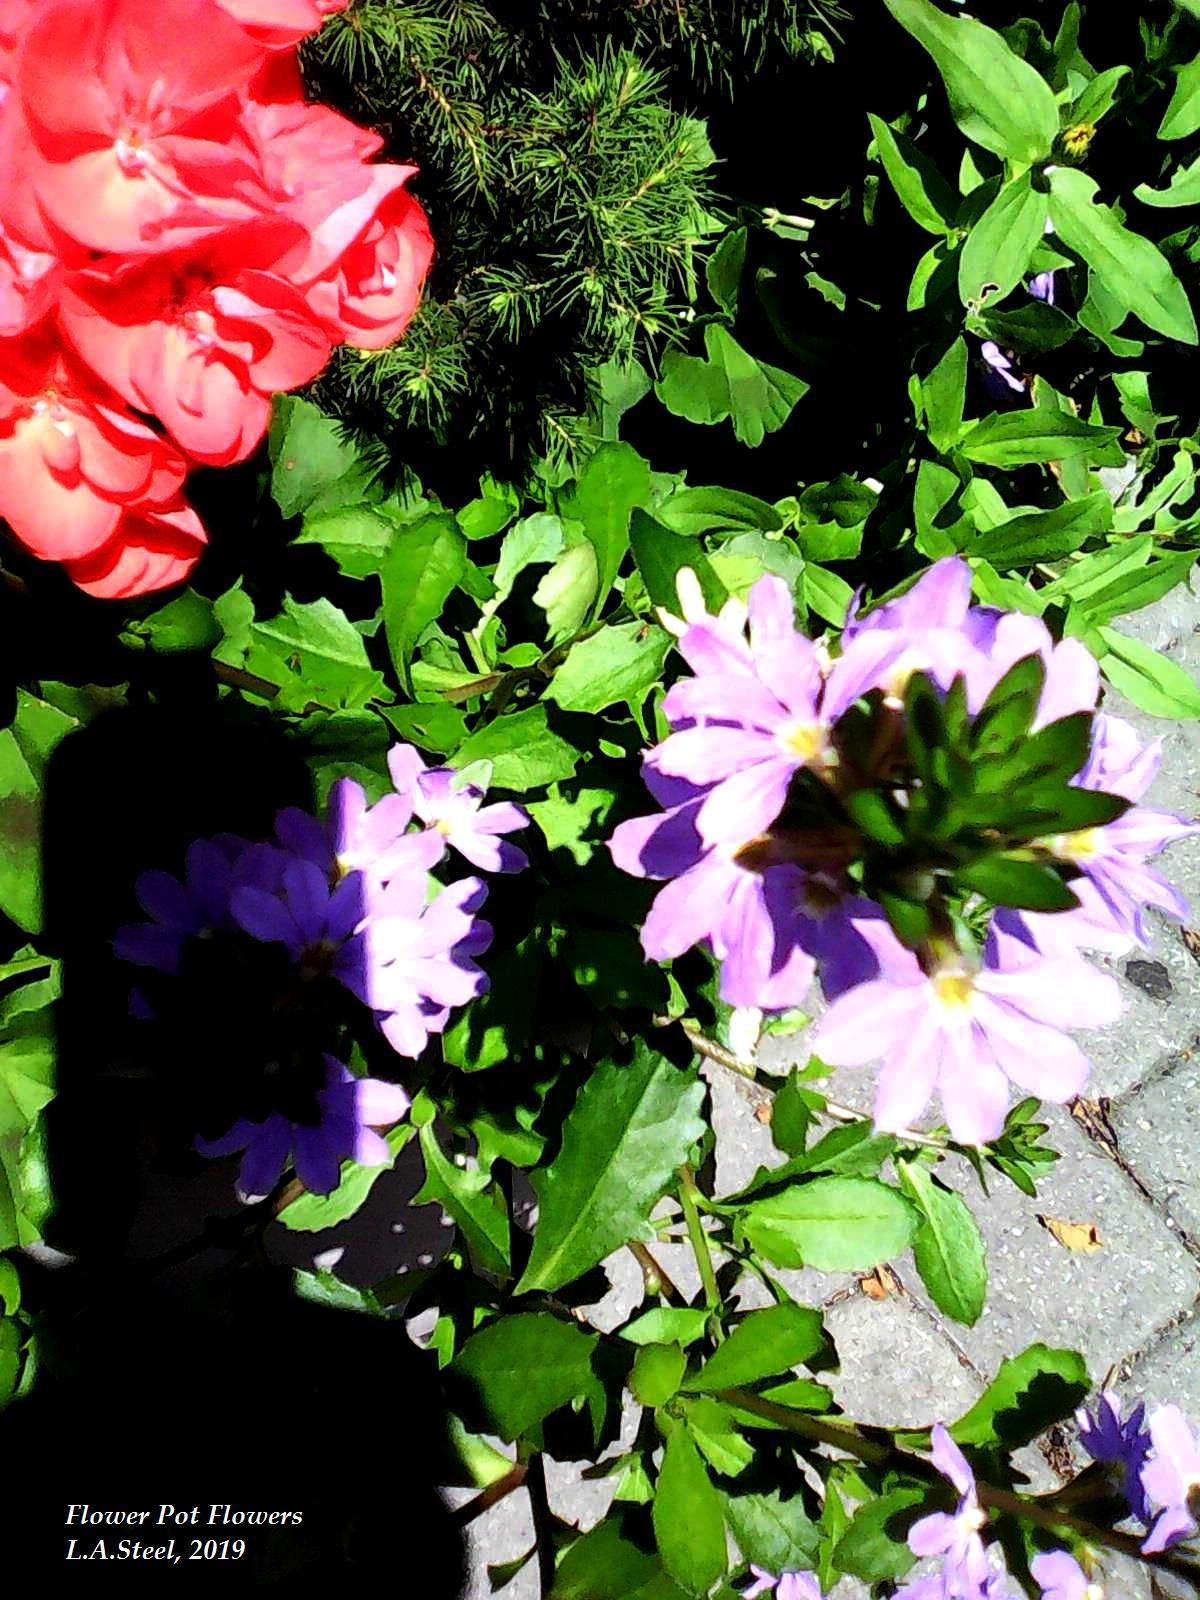 flower pot flowers 2019 1